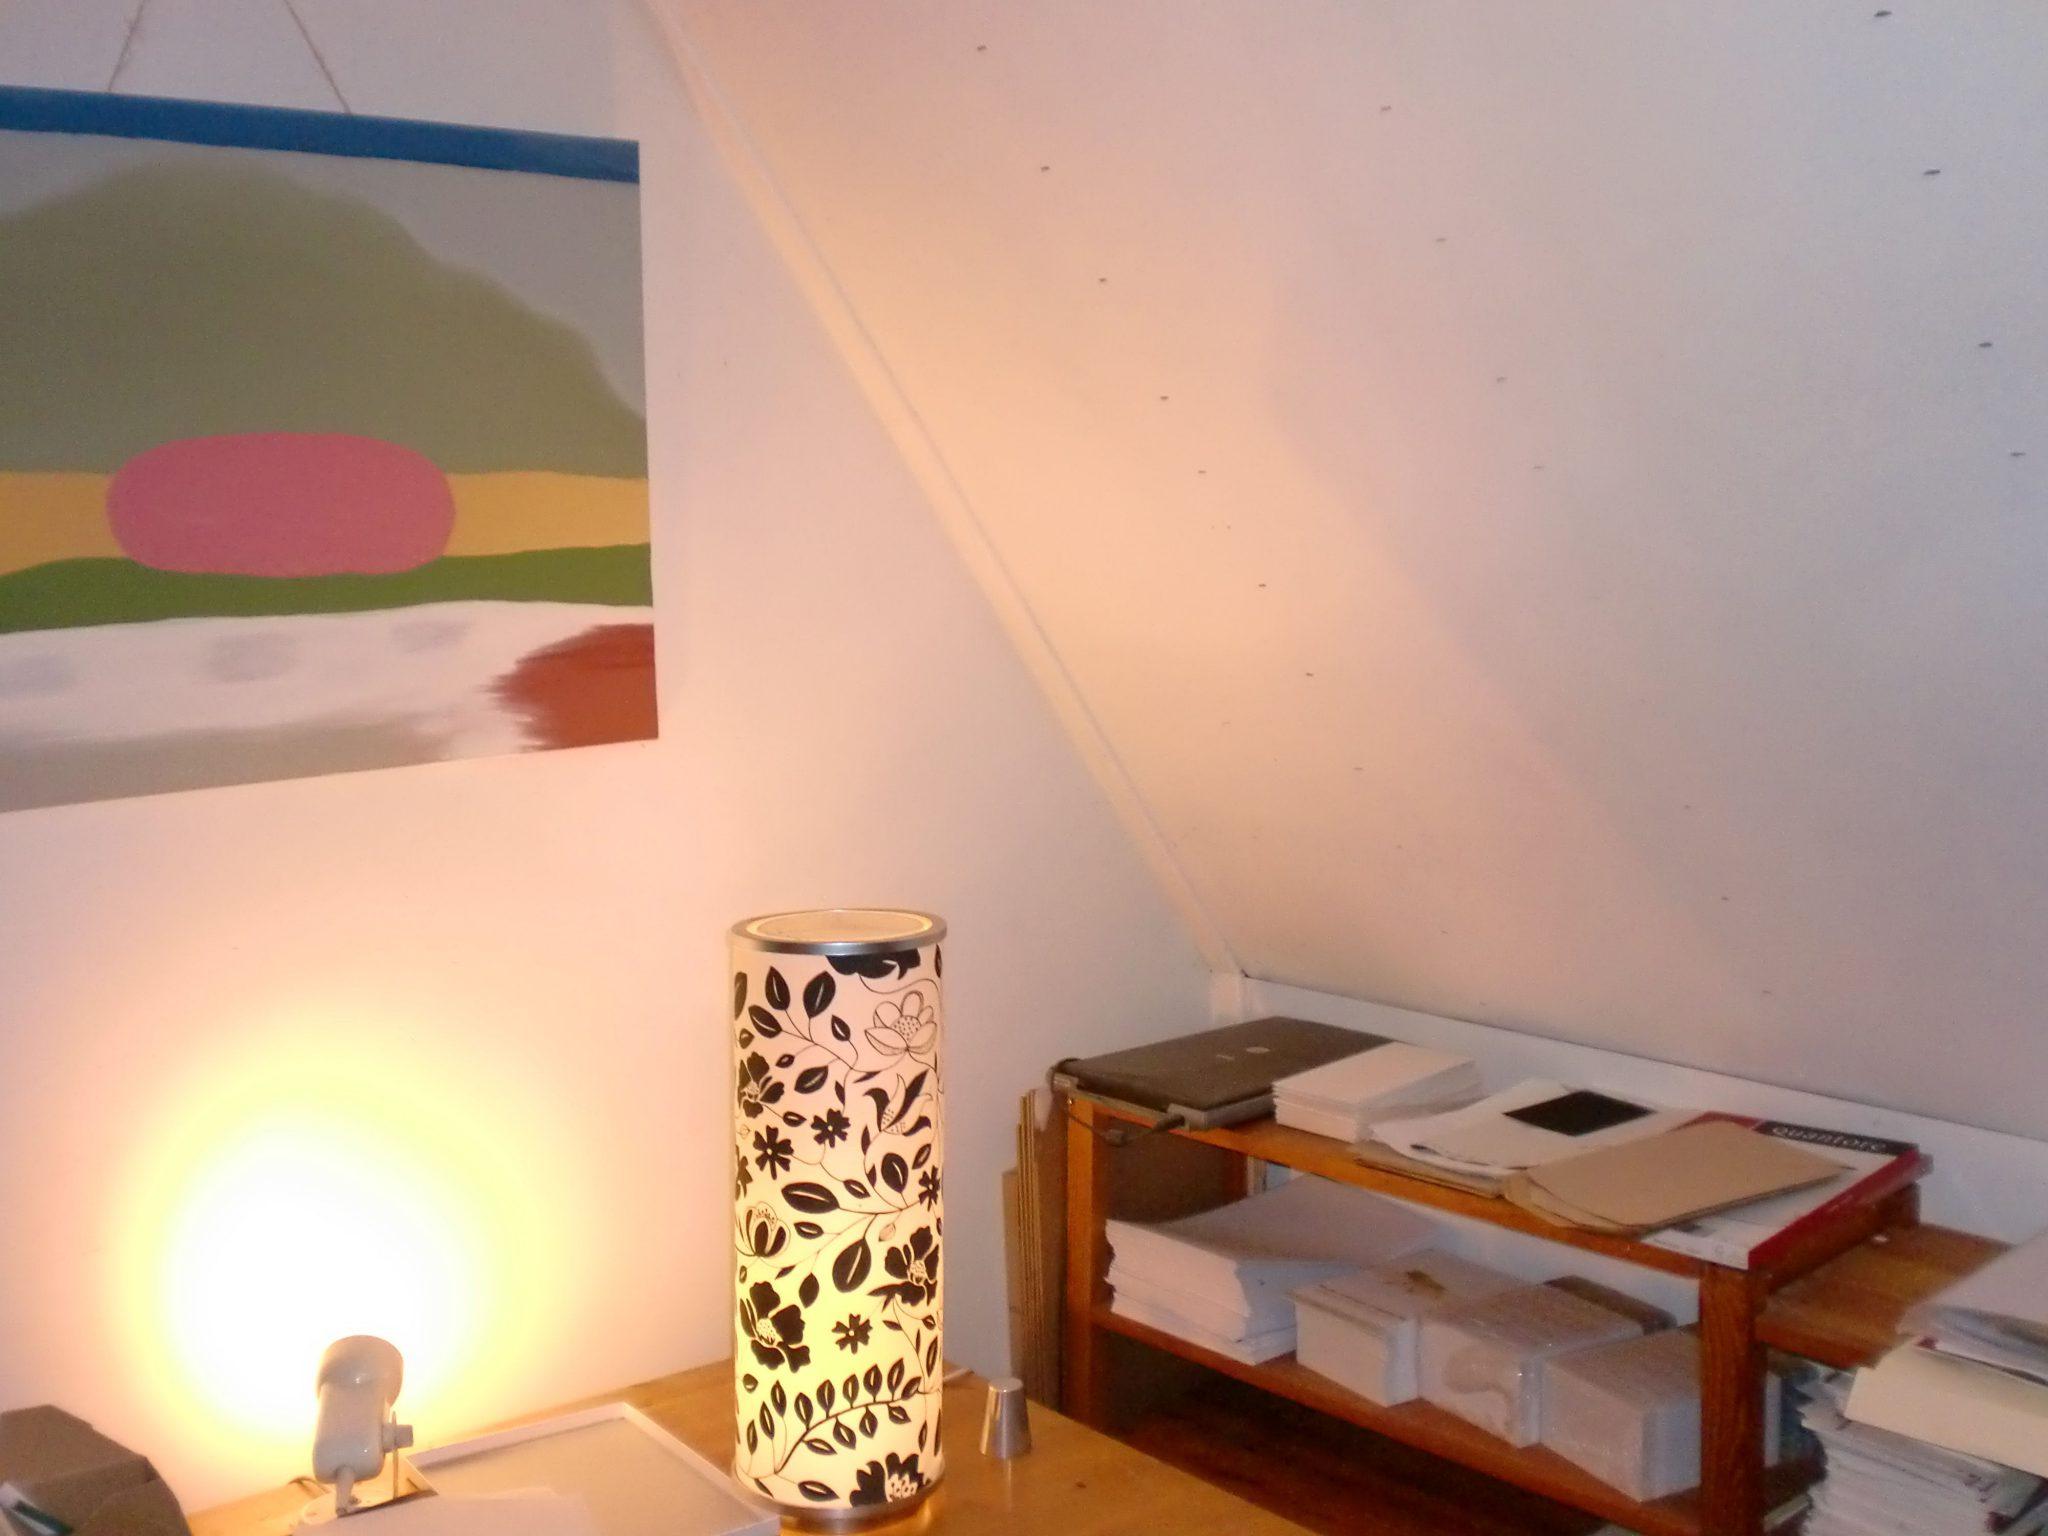 Woonkamer verven of slaapkamer verven  Moose Frg Belgi